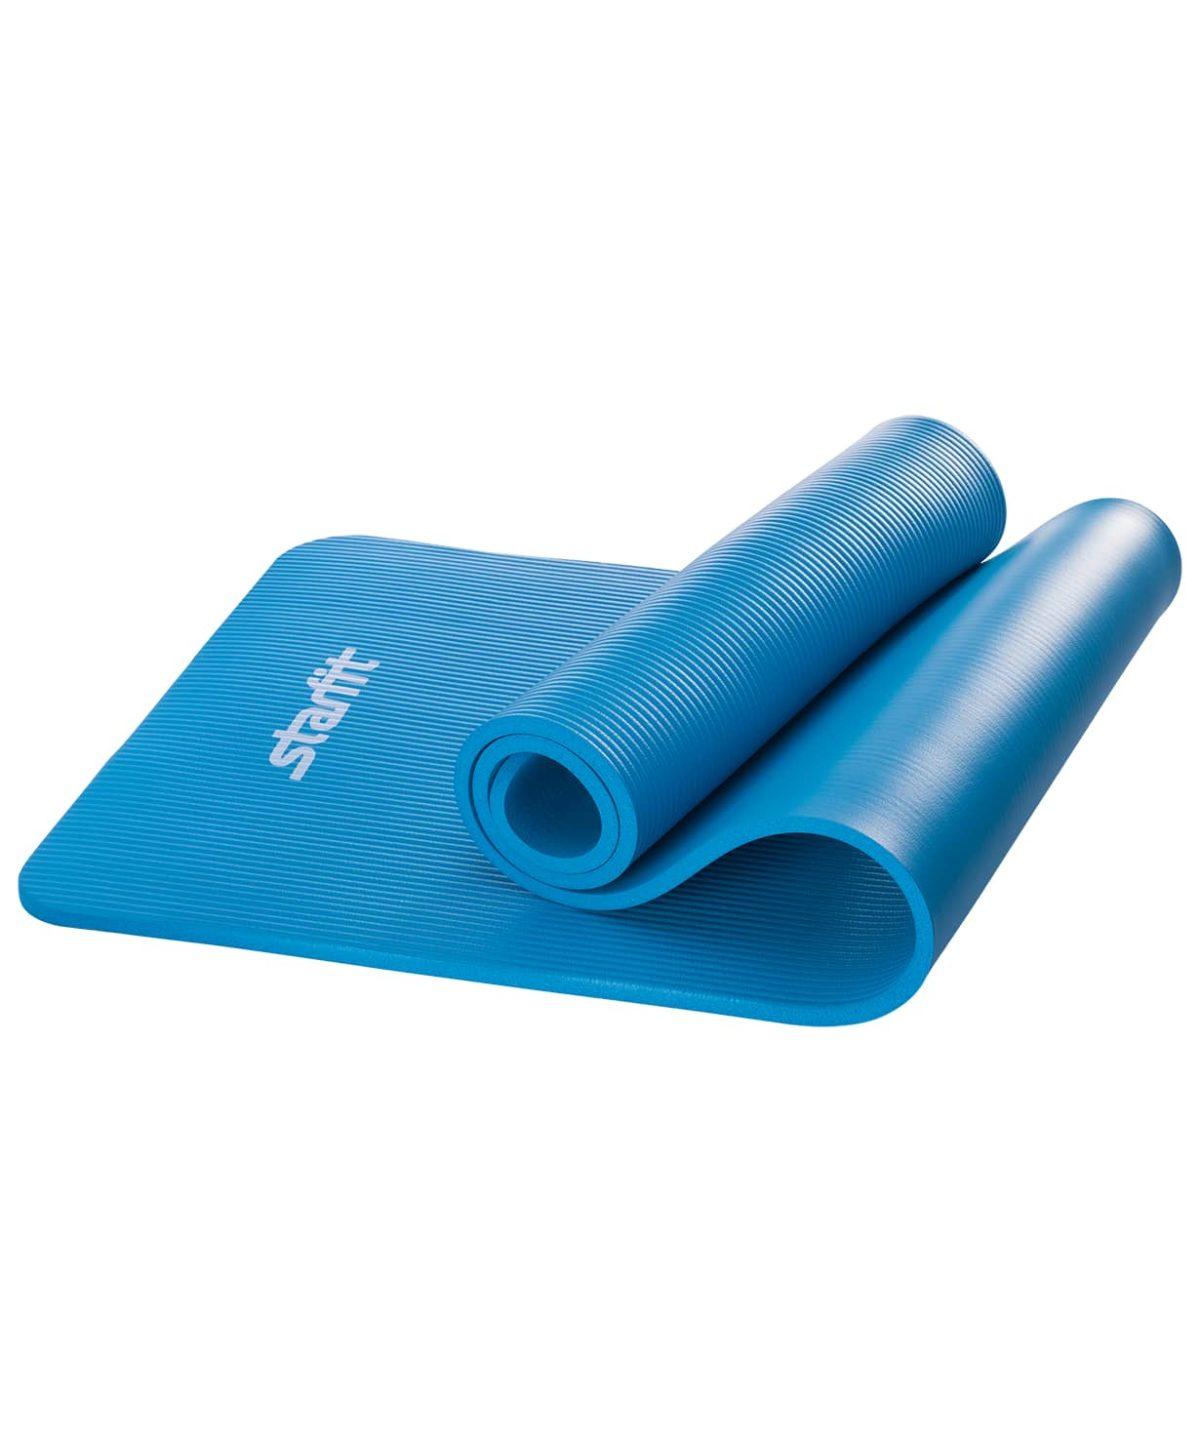 STARFIT Коврик для йоги FM-301 183x58x1,2 см: синий - 1